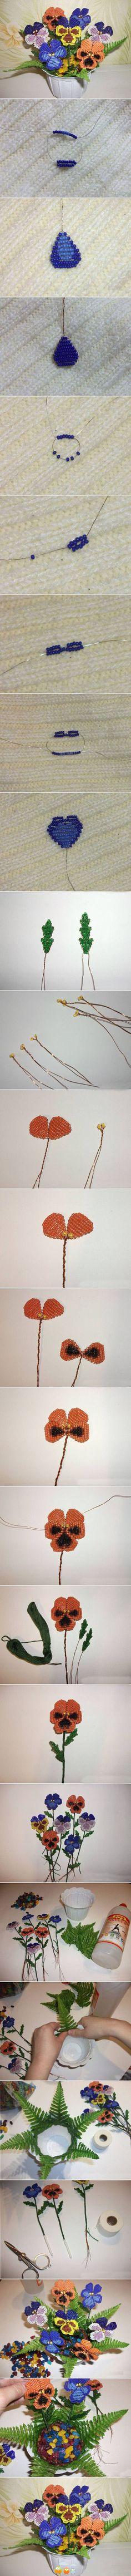 DIY Beautiful Flowers with Beads